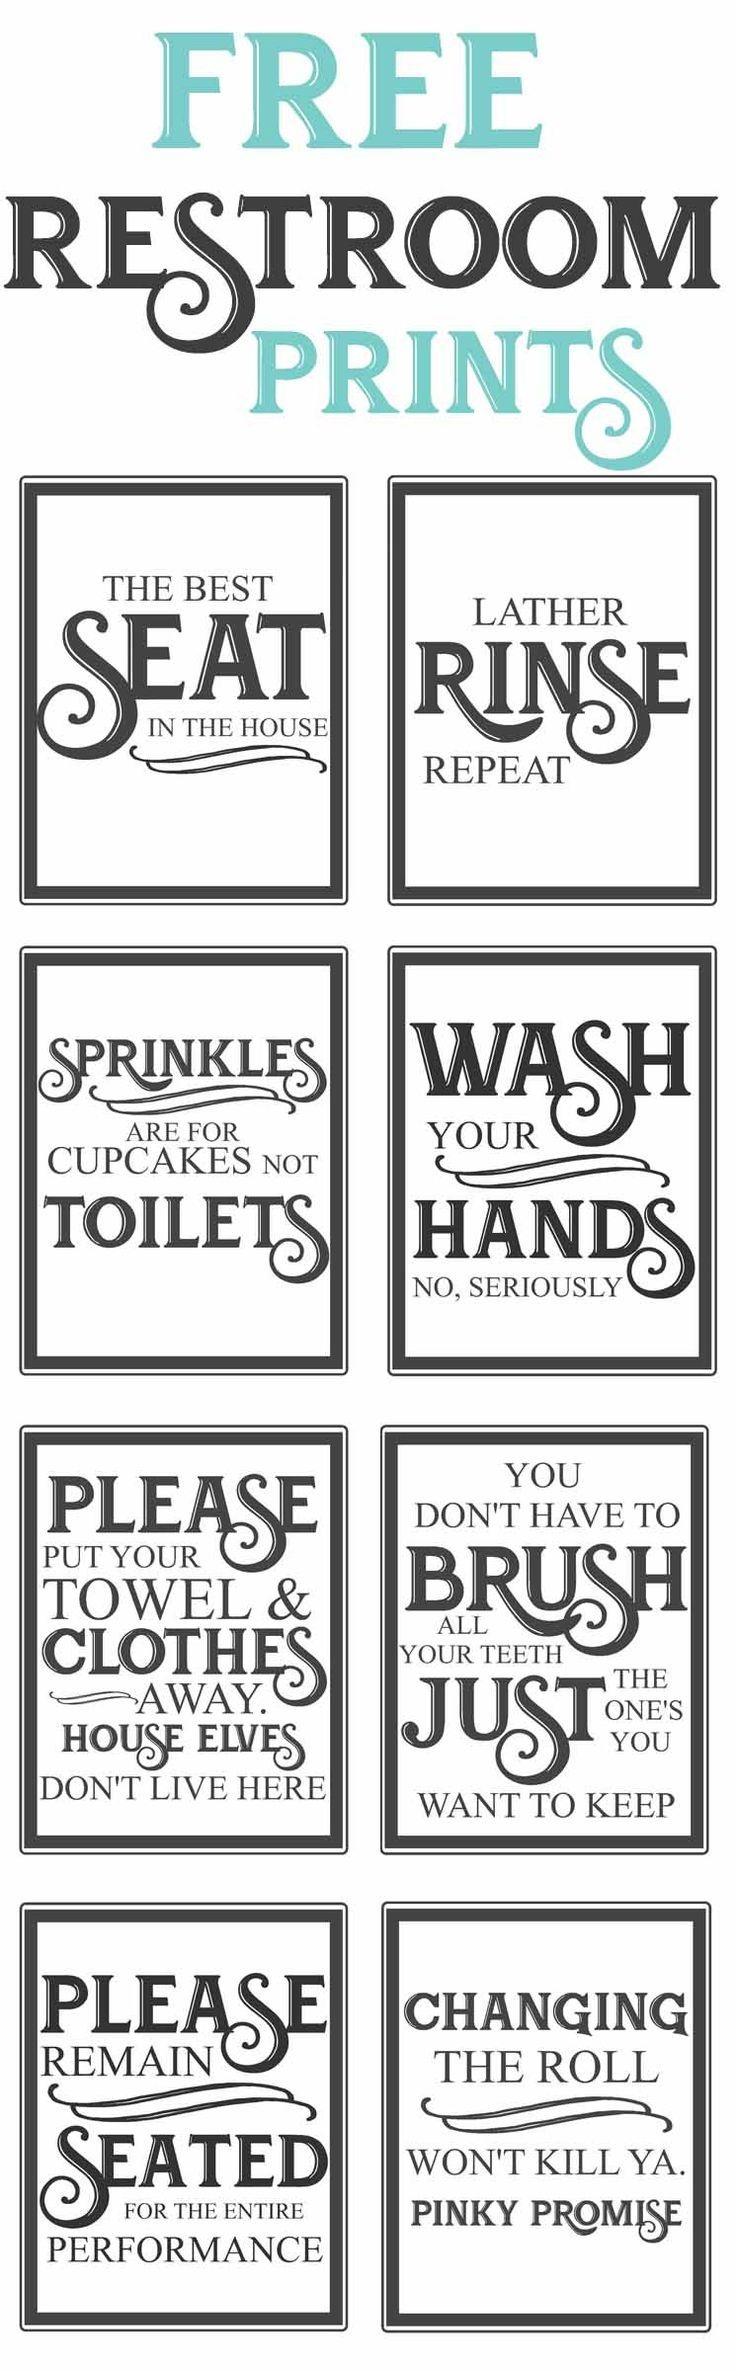 Free Vintage Bathroom Printables | Farmhouse | Diy Home Decor, Home - Free Printable Bathroom Quotes